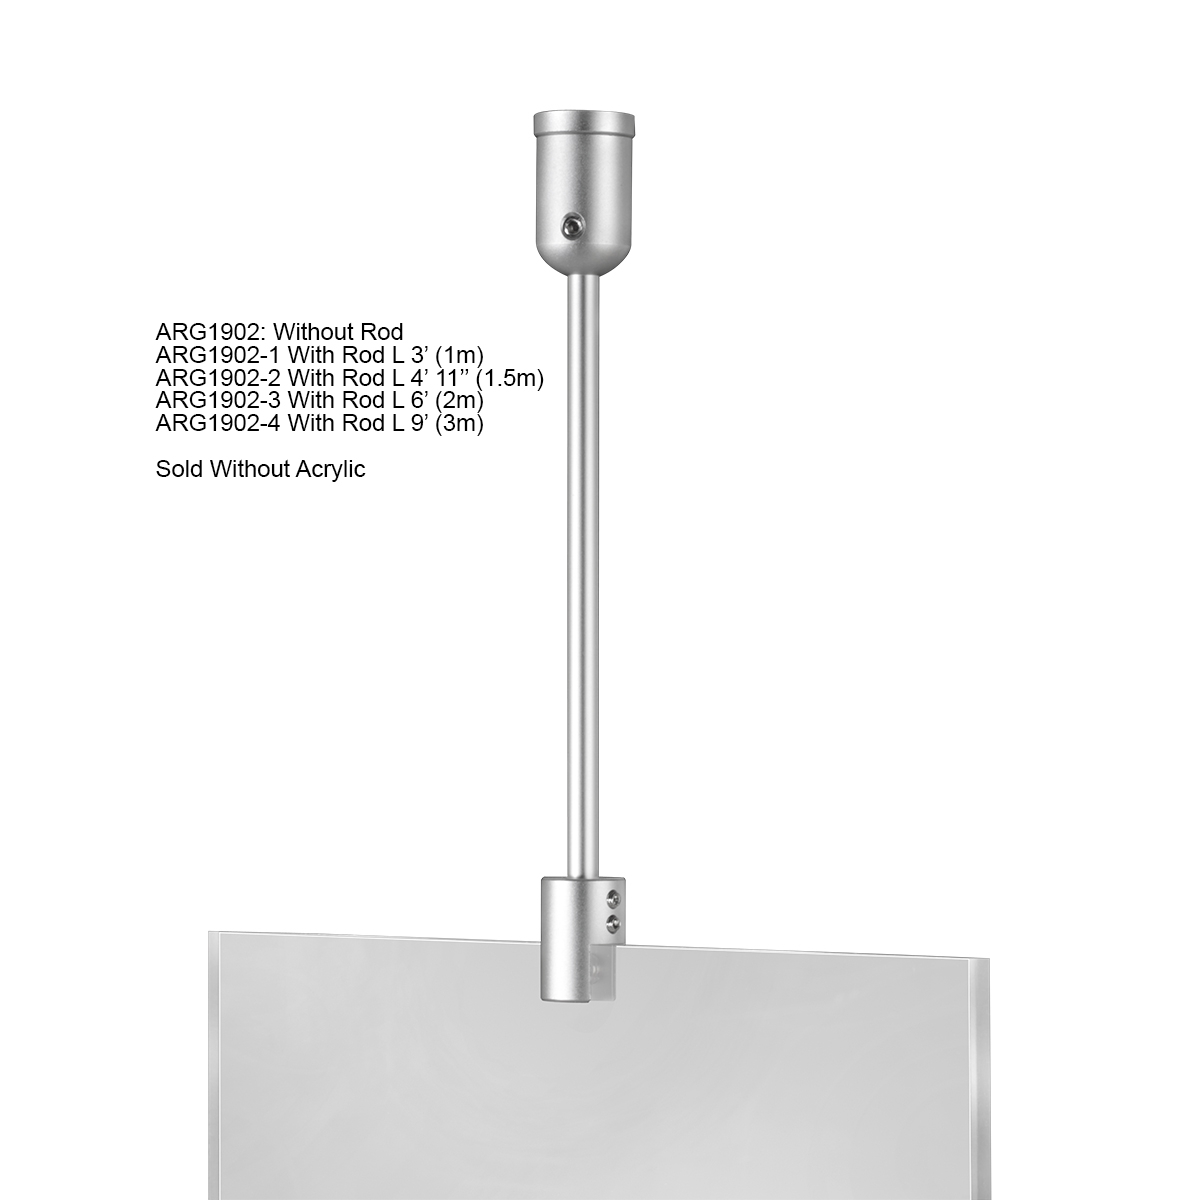 Ceiling Suspended Rod Kit - 4' 11'' - Aluminum Mounts - Stainless Steel Rod